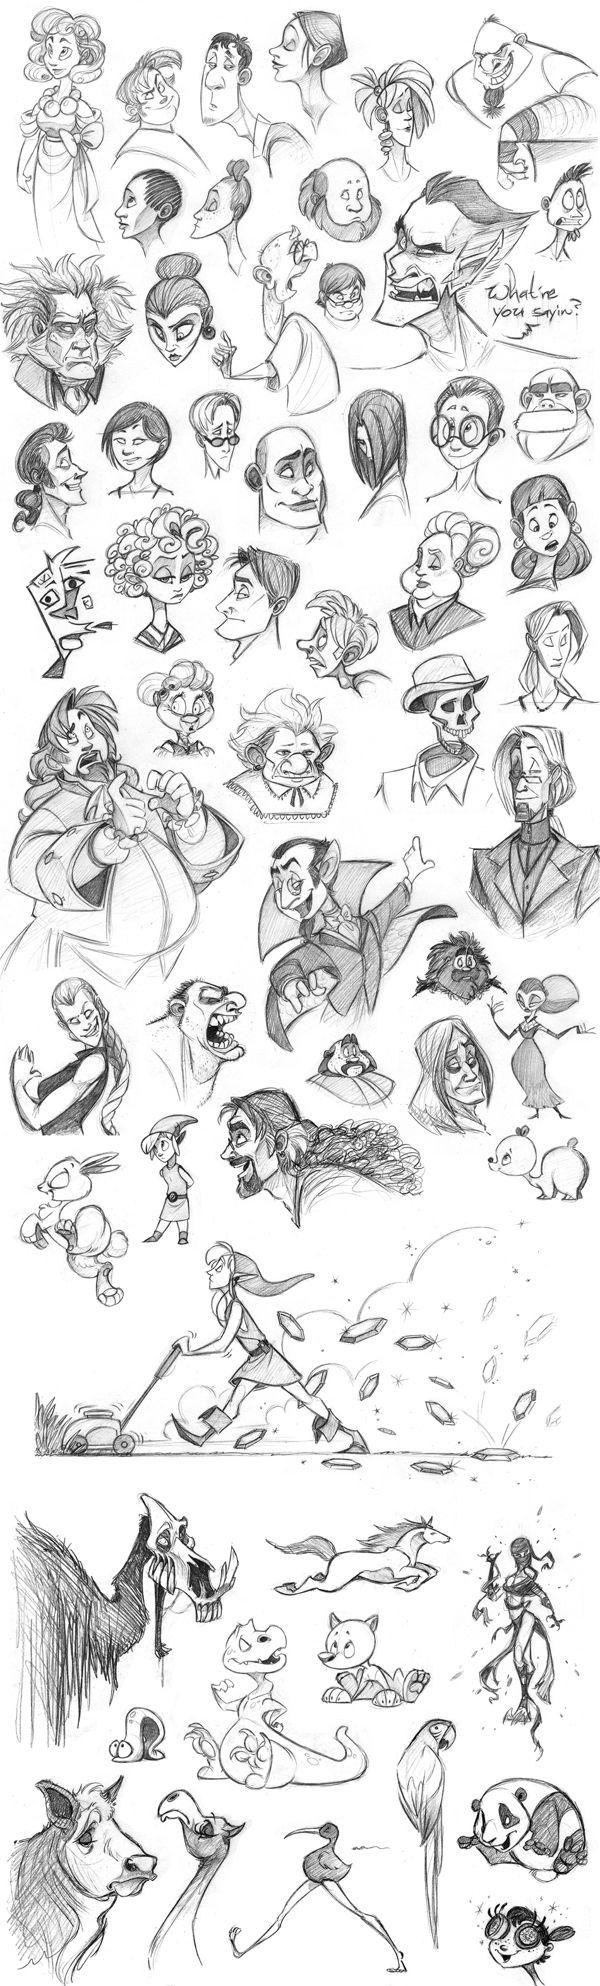 LEAH FUHRMAN ► #illustration #character #design #concept #art #pencil #sketch #blackandwhite #expression #portrait #animals